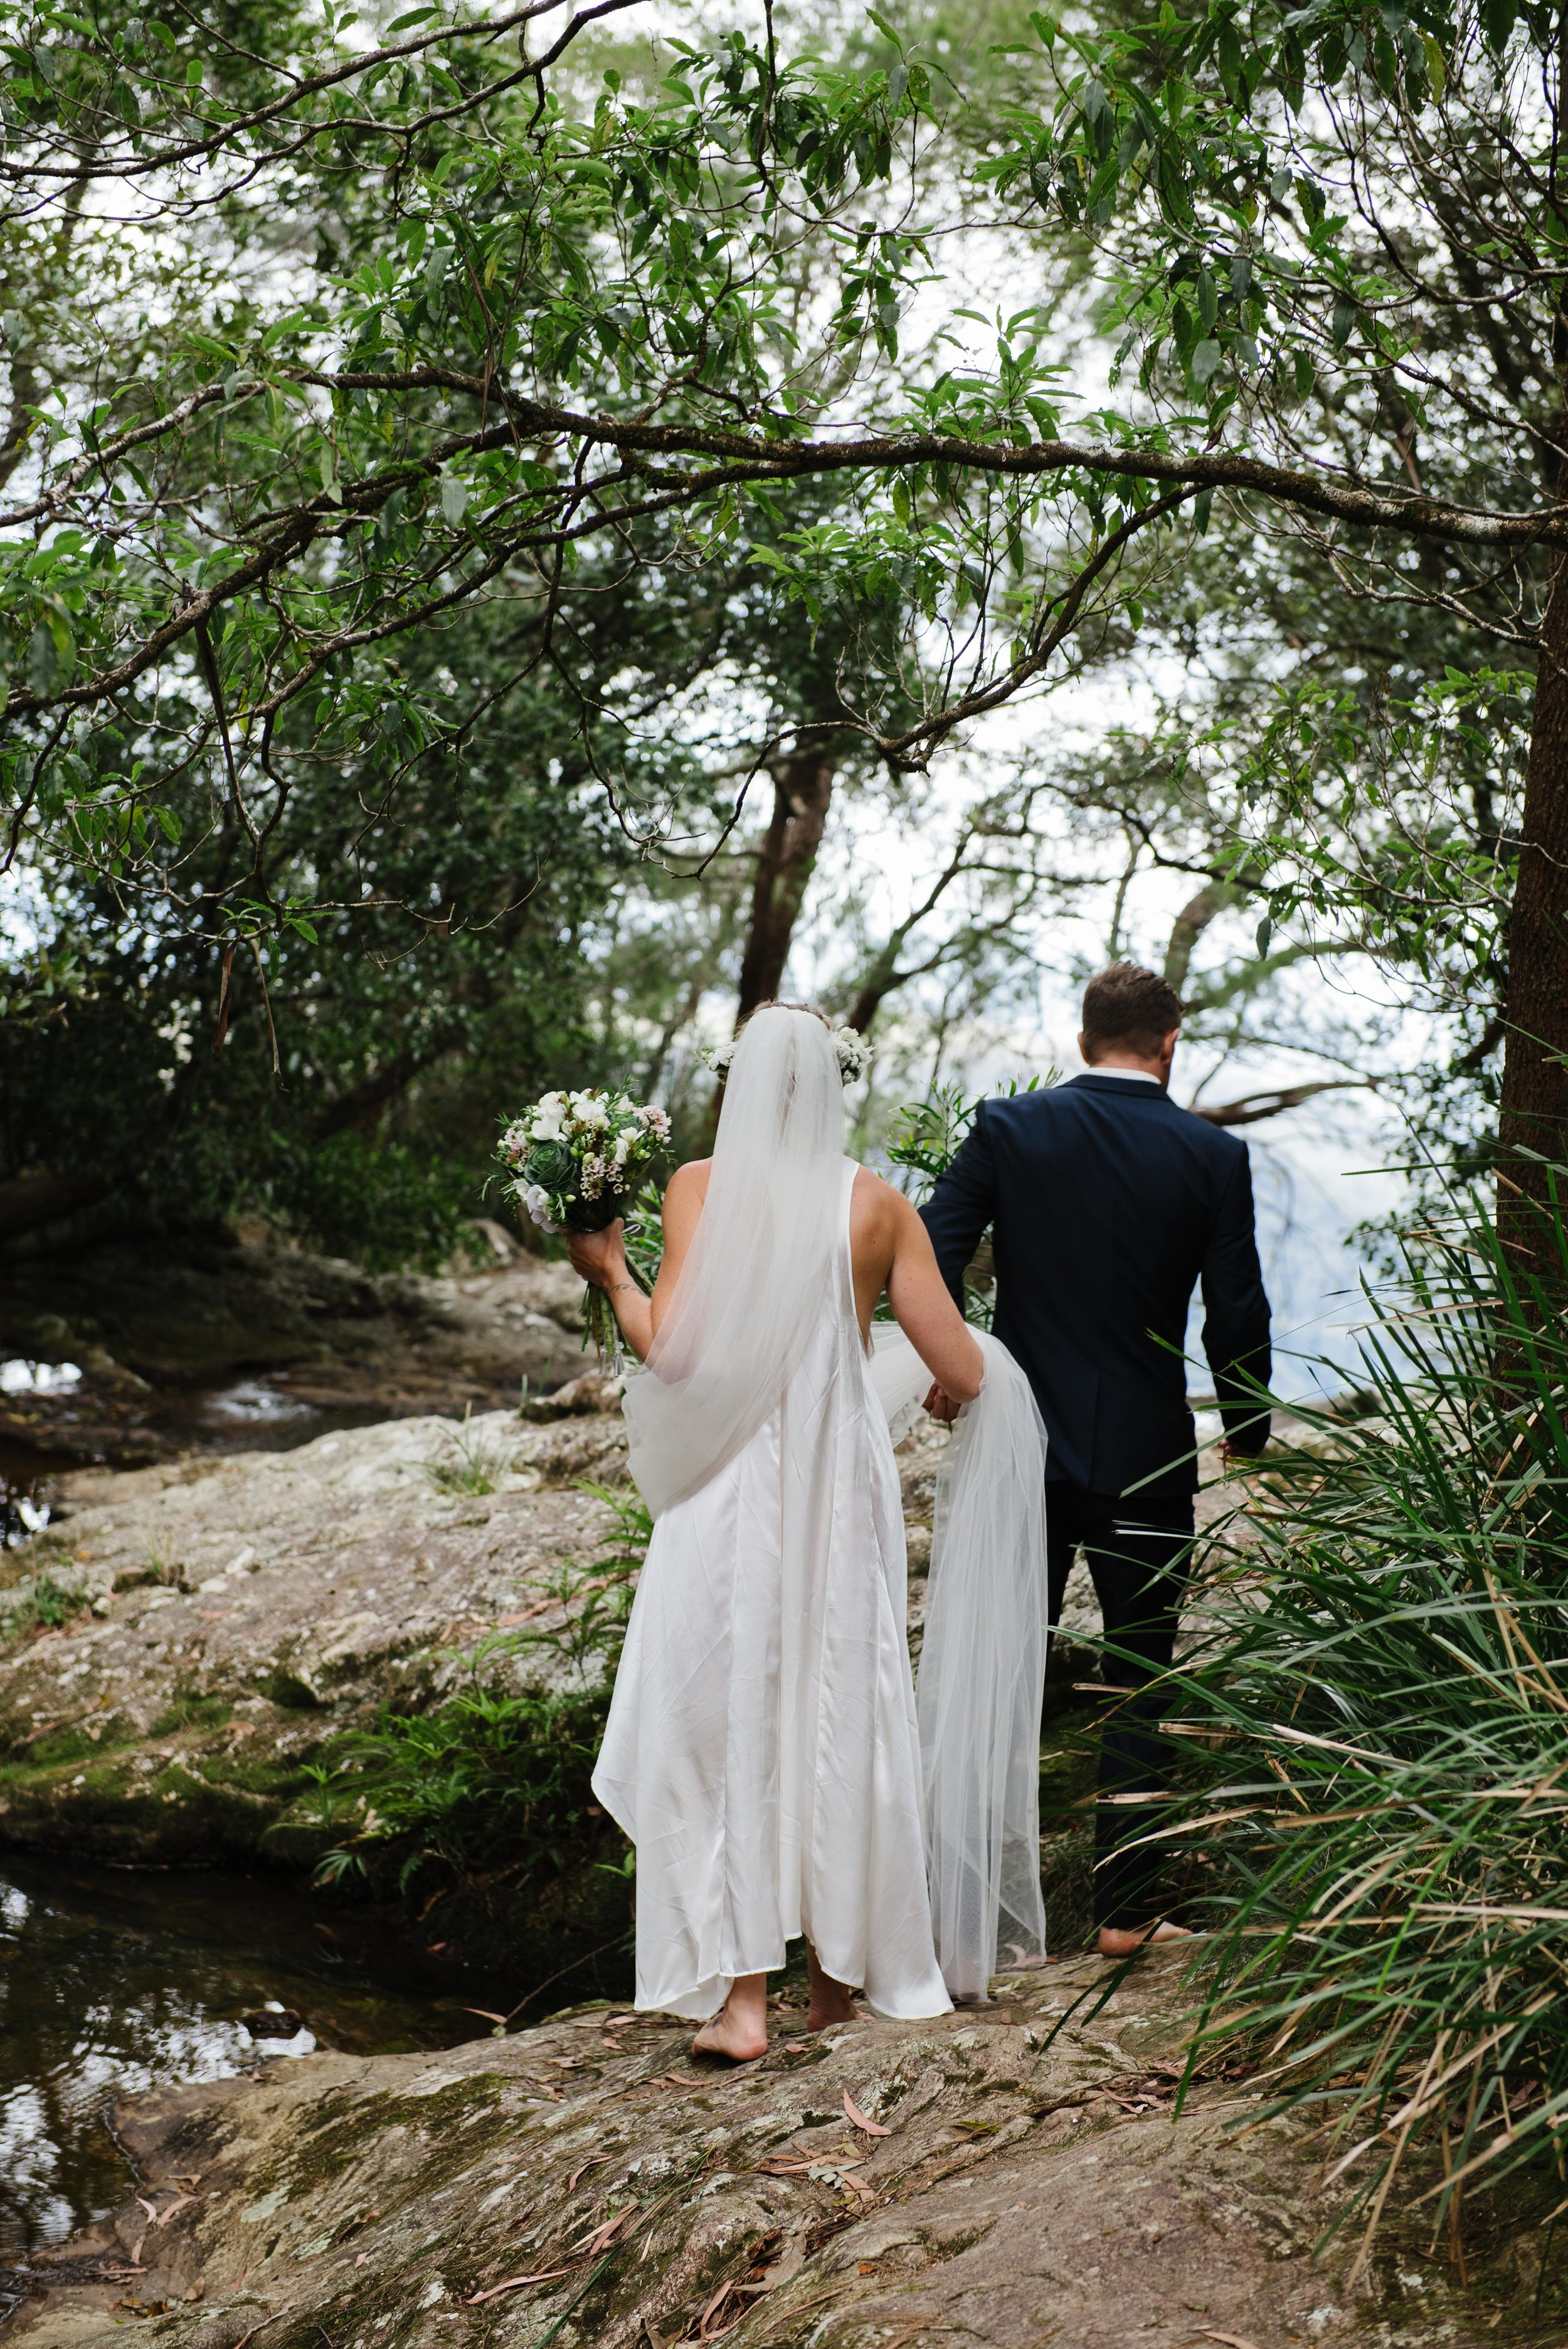 Carla and Luke- wedding photographer, byron bay wedding and family photographer, tweed heads wedding and family photography-269.jpg